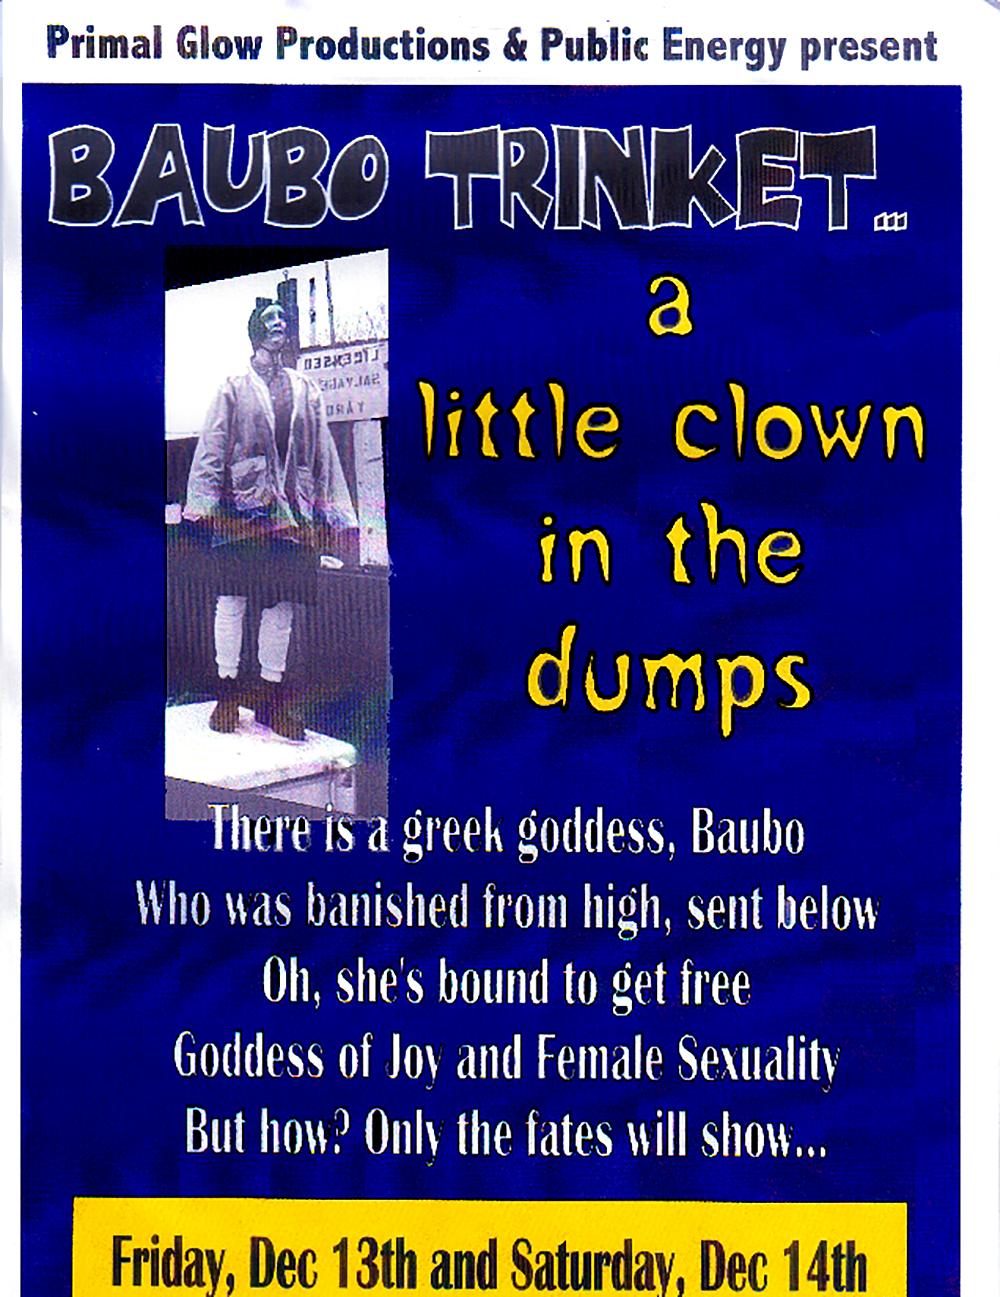 Poster for Baubo Trinket